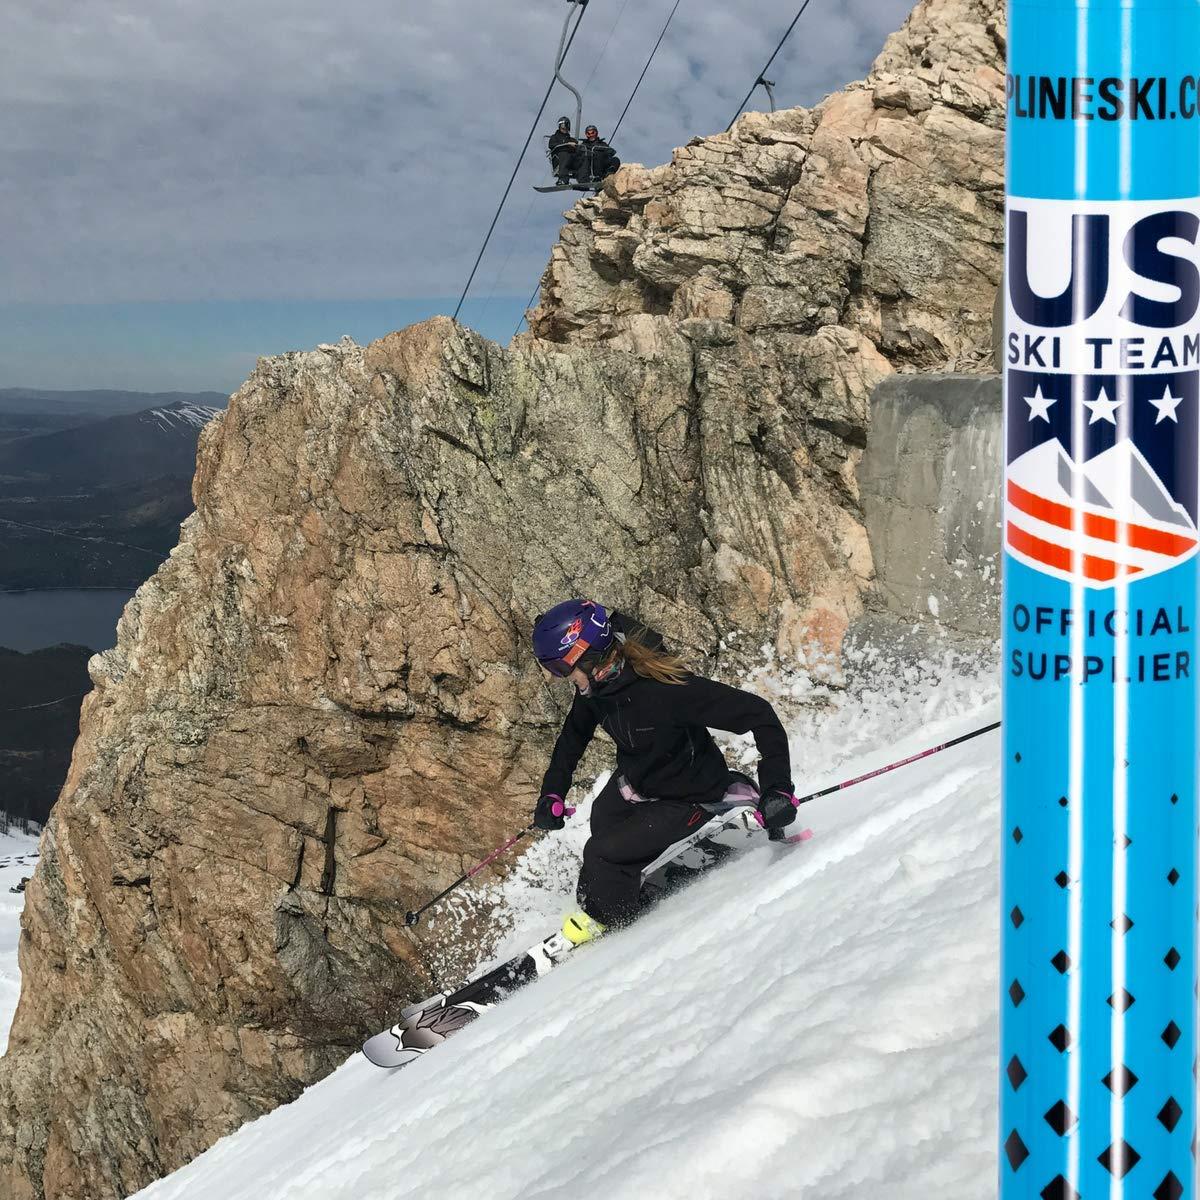 Downhill//Mens//Womens//Kids//Junior//Freestyle//Racing Zipline Ski Poles Carbon Composite Graphite Blurr 16.0 U.S Tropical Blue, 50 in.//127 cm Ski Team Official Ski Pole